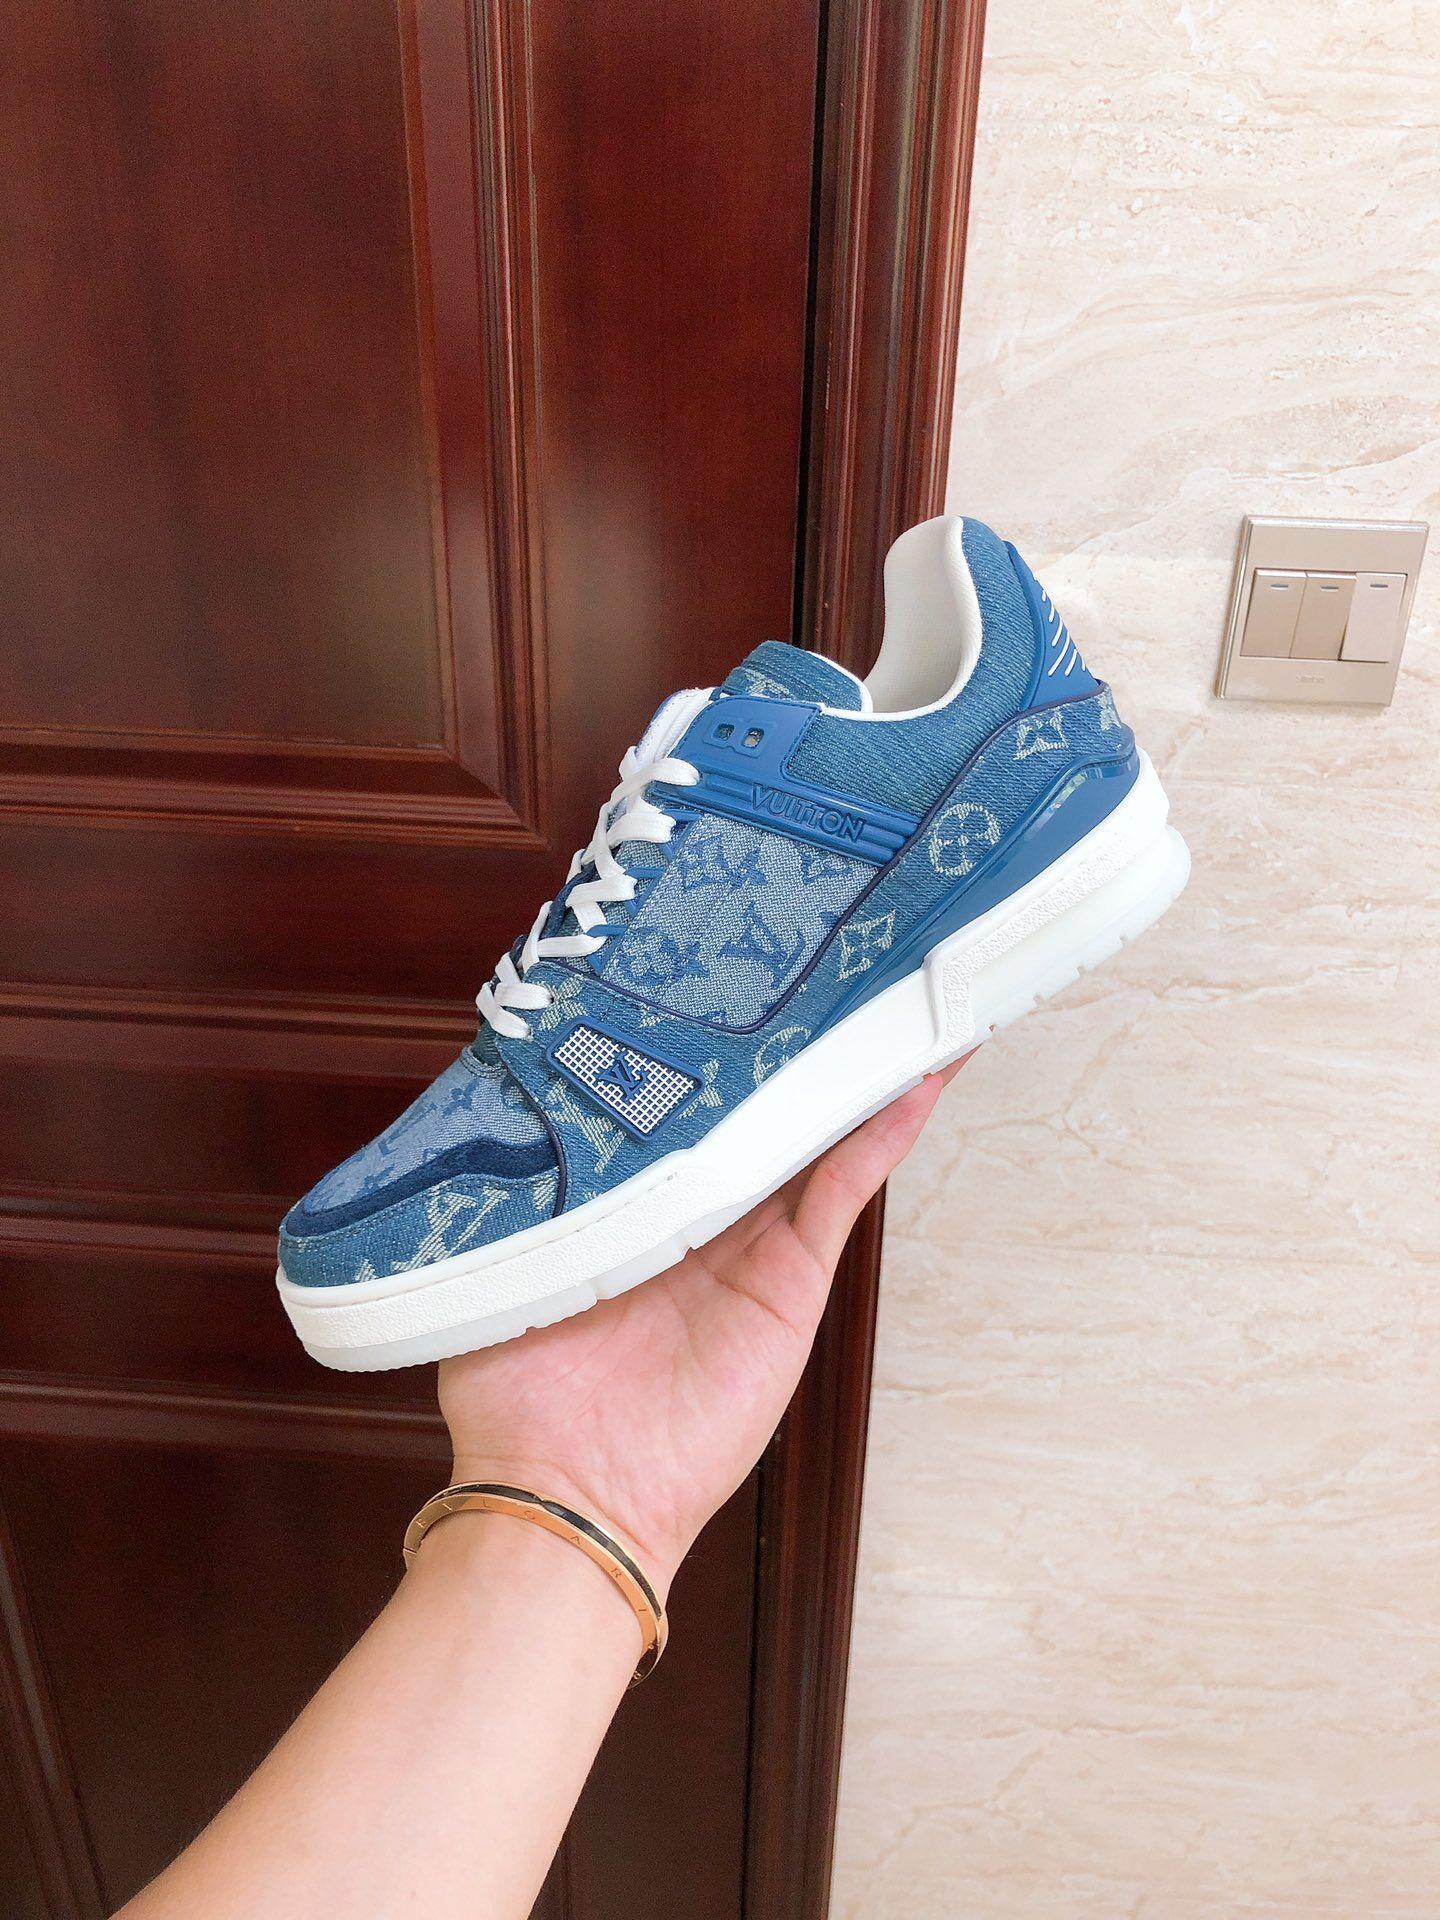 trainer sneaker Blue Monogram denim    sneaker    shoes 1A7S51 5